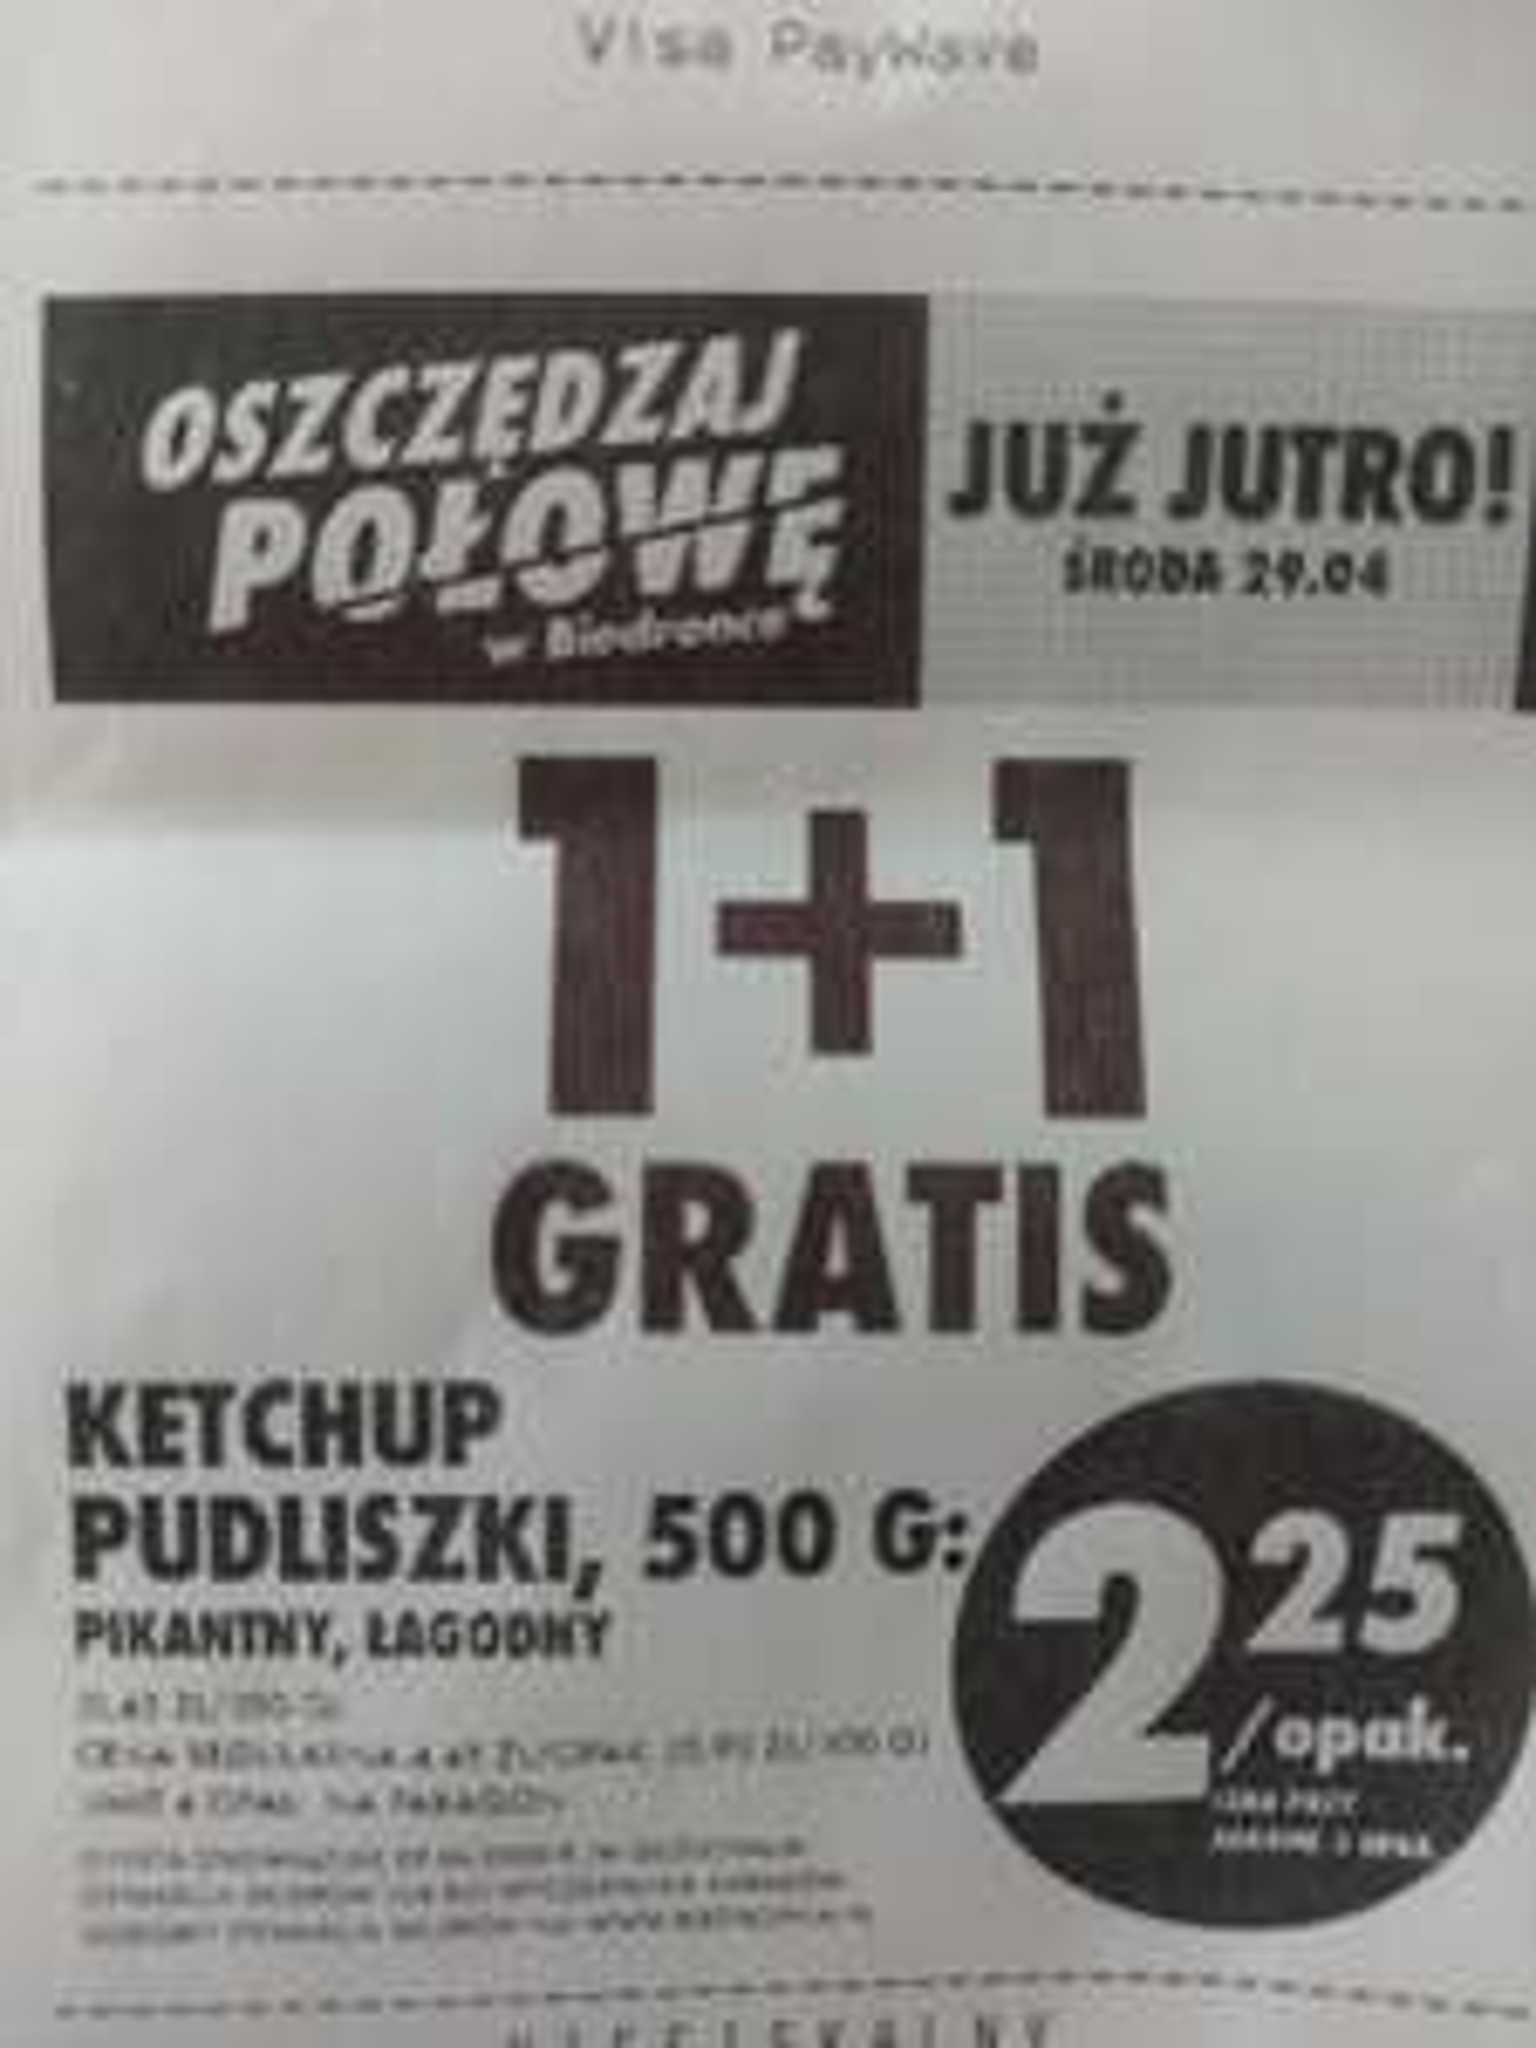 Biedronka ketchup pudliszki 1+1